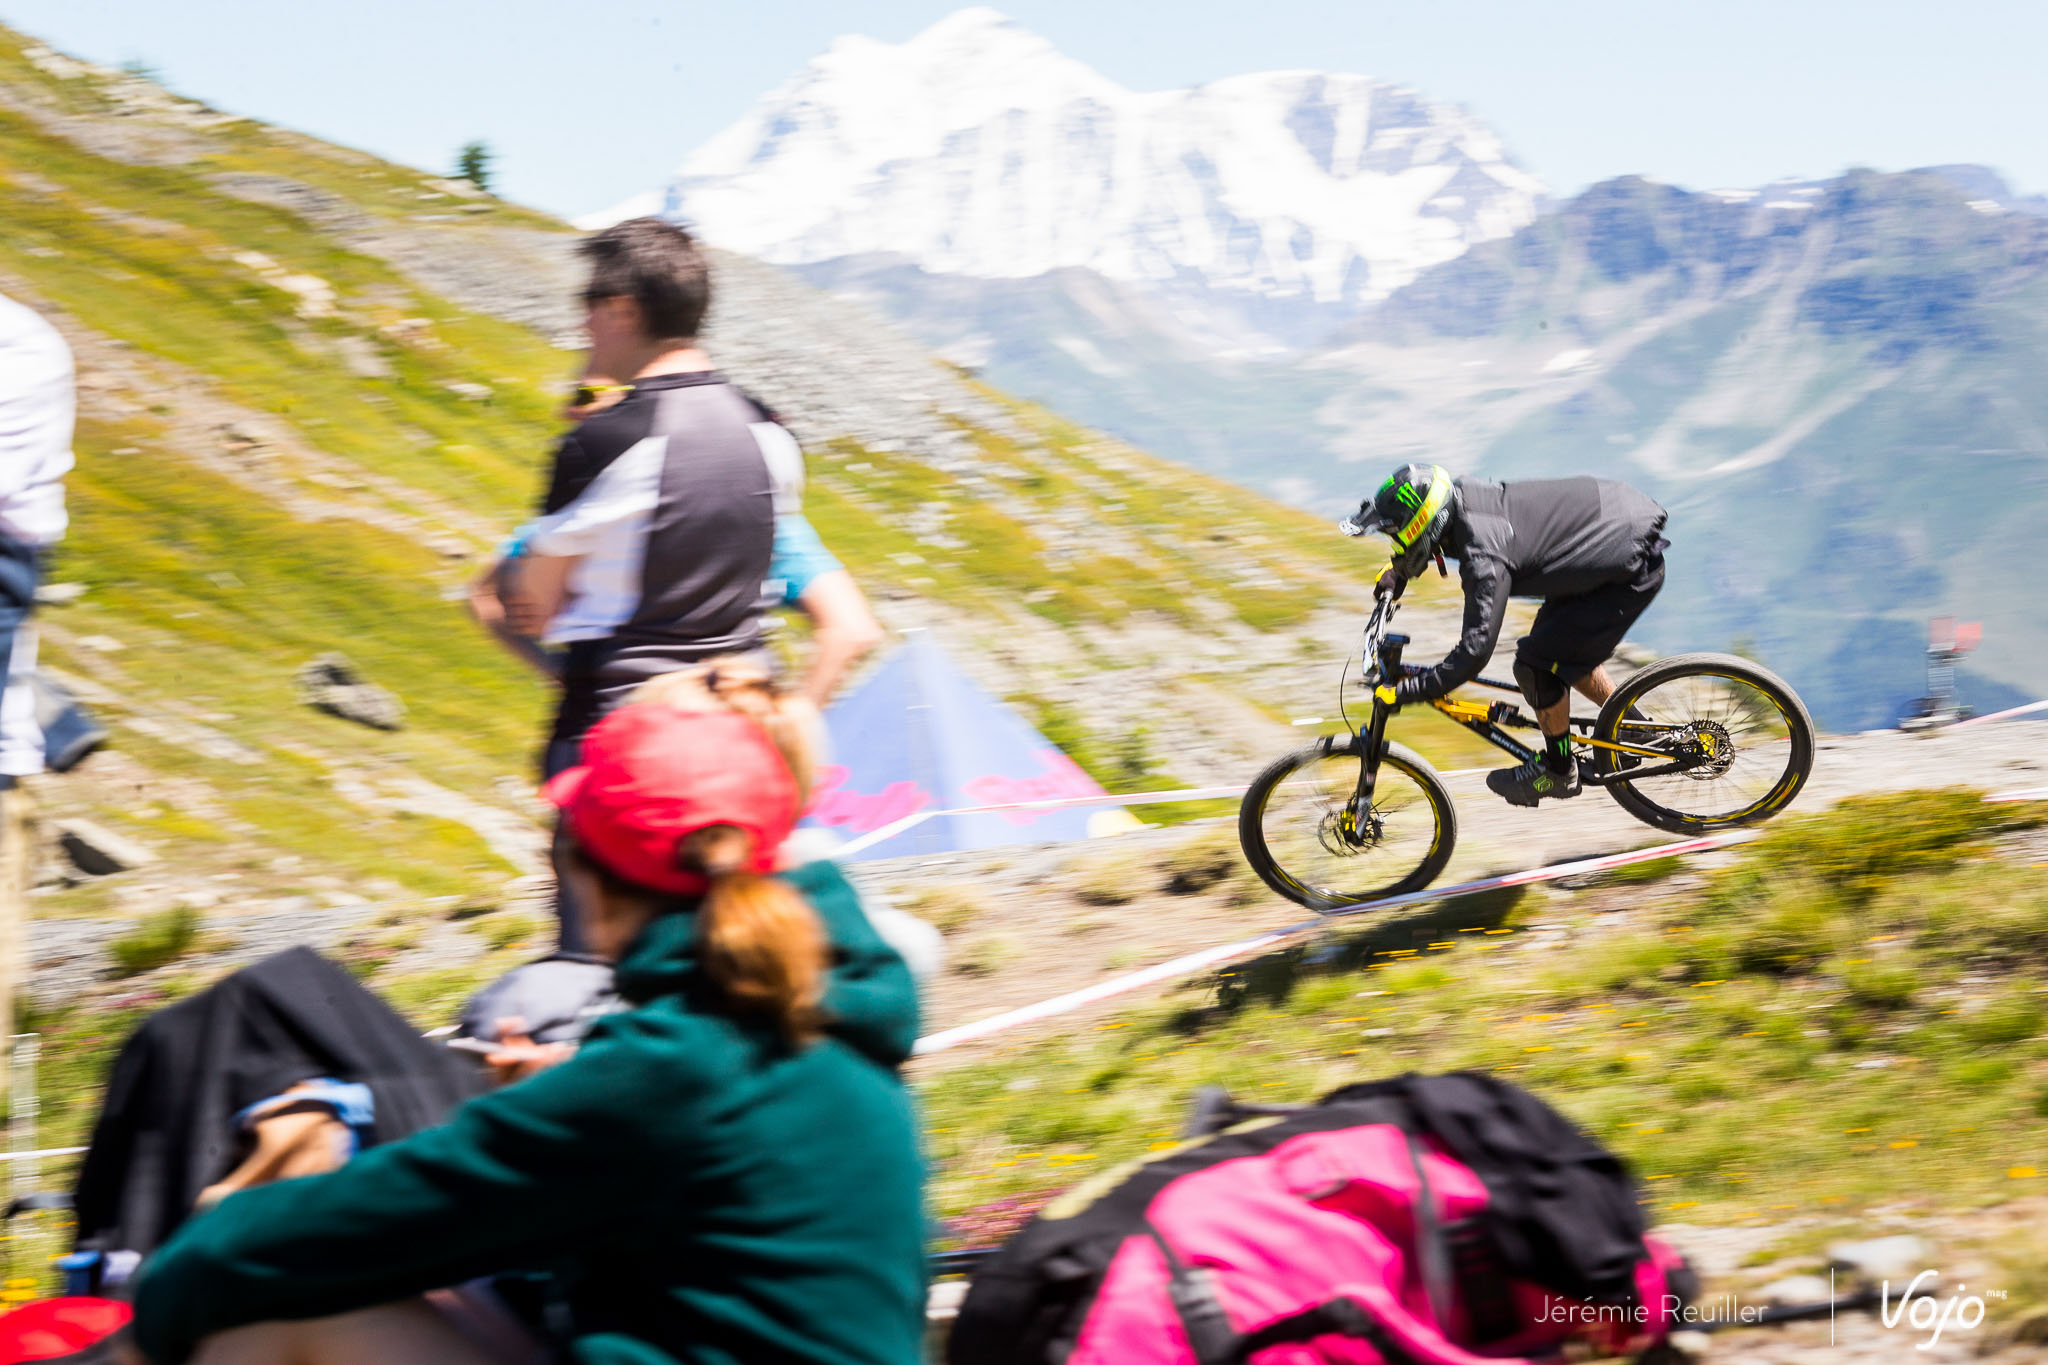 EWS_La_Thuile_raceday_1_Copyright_Reuiller_VojoMag-27